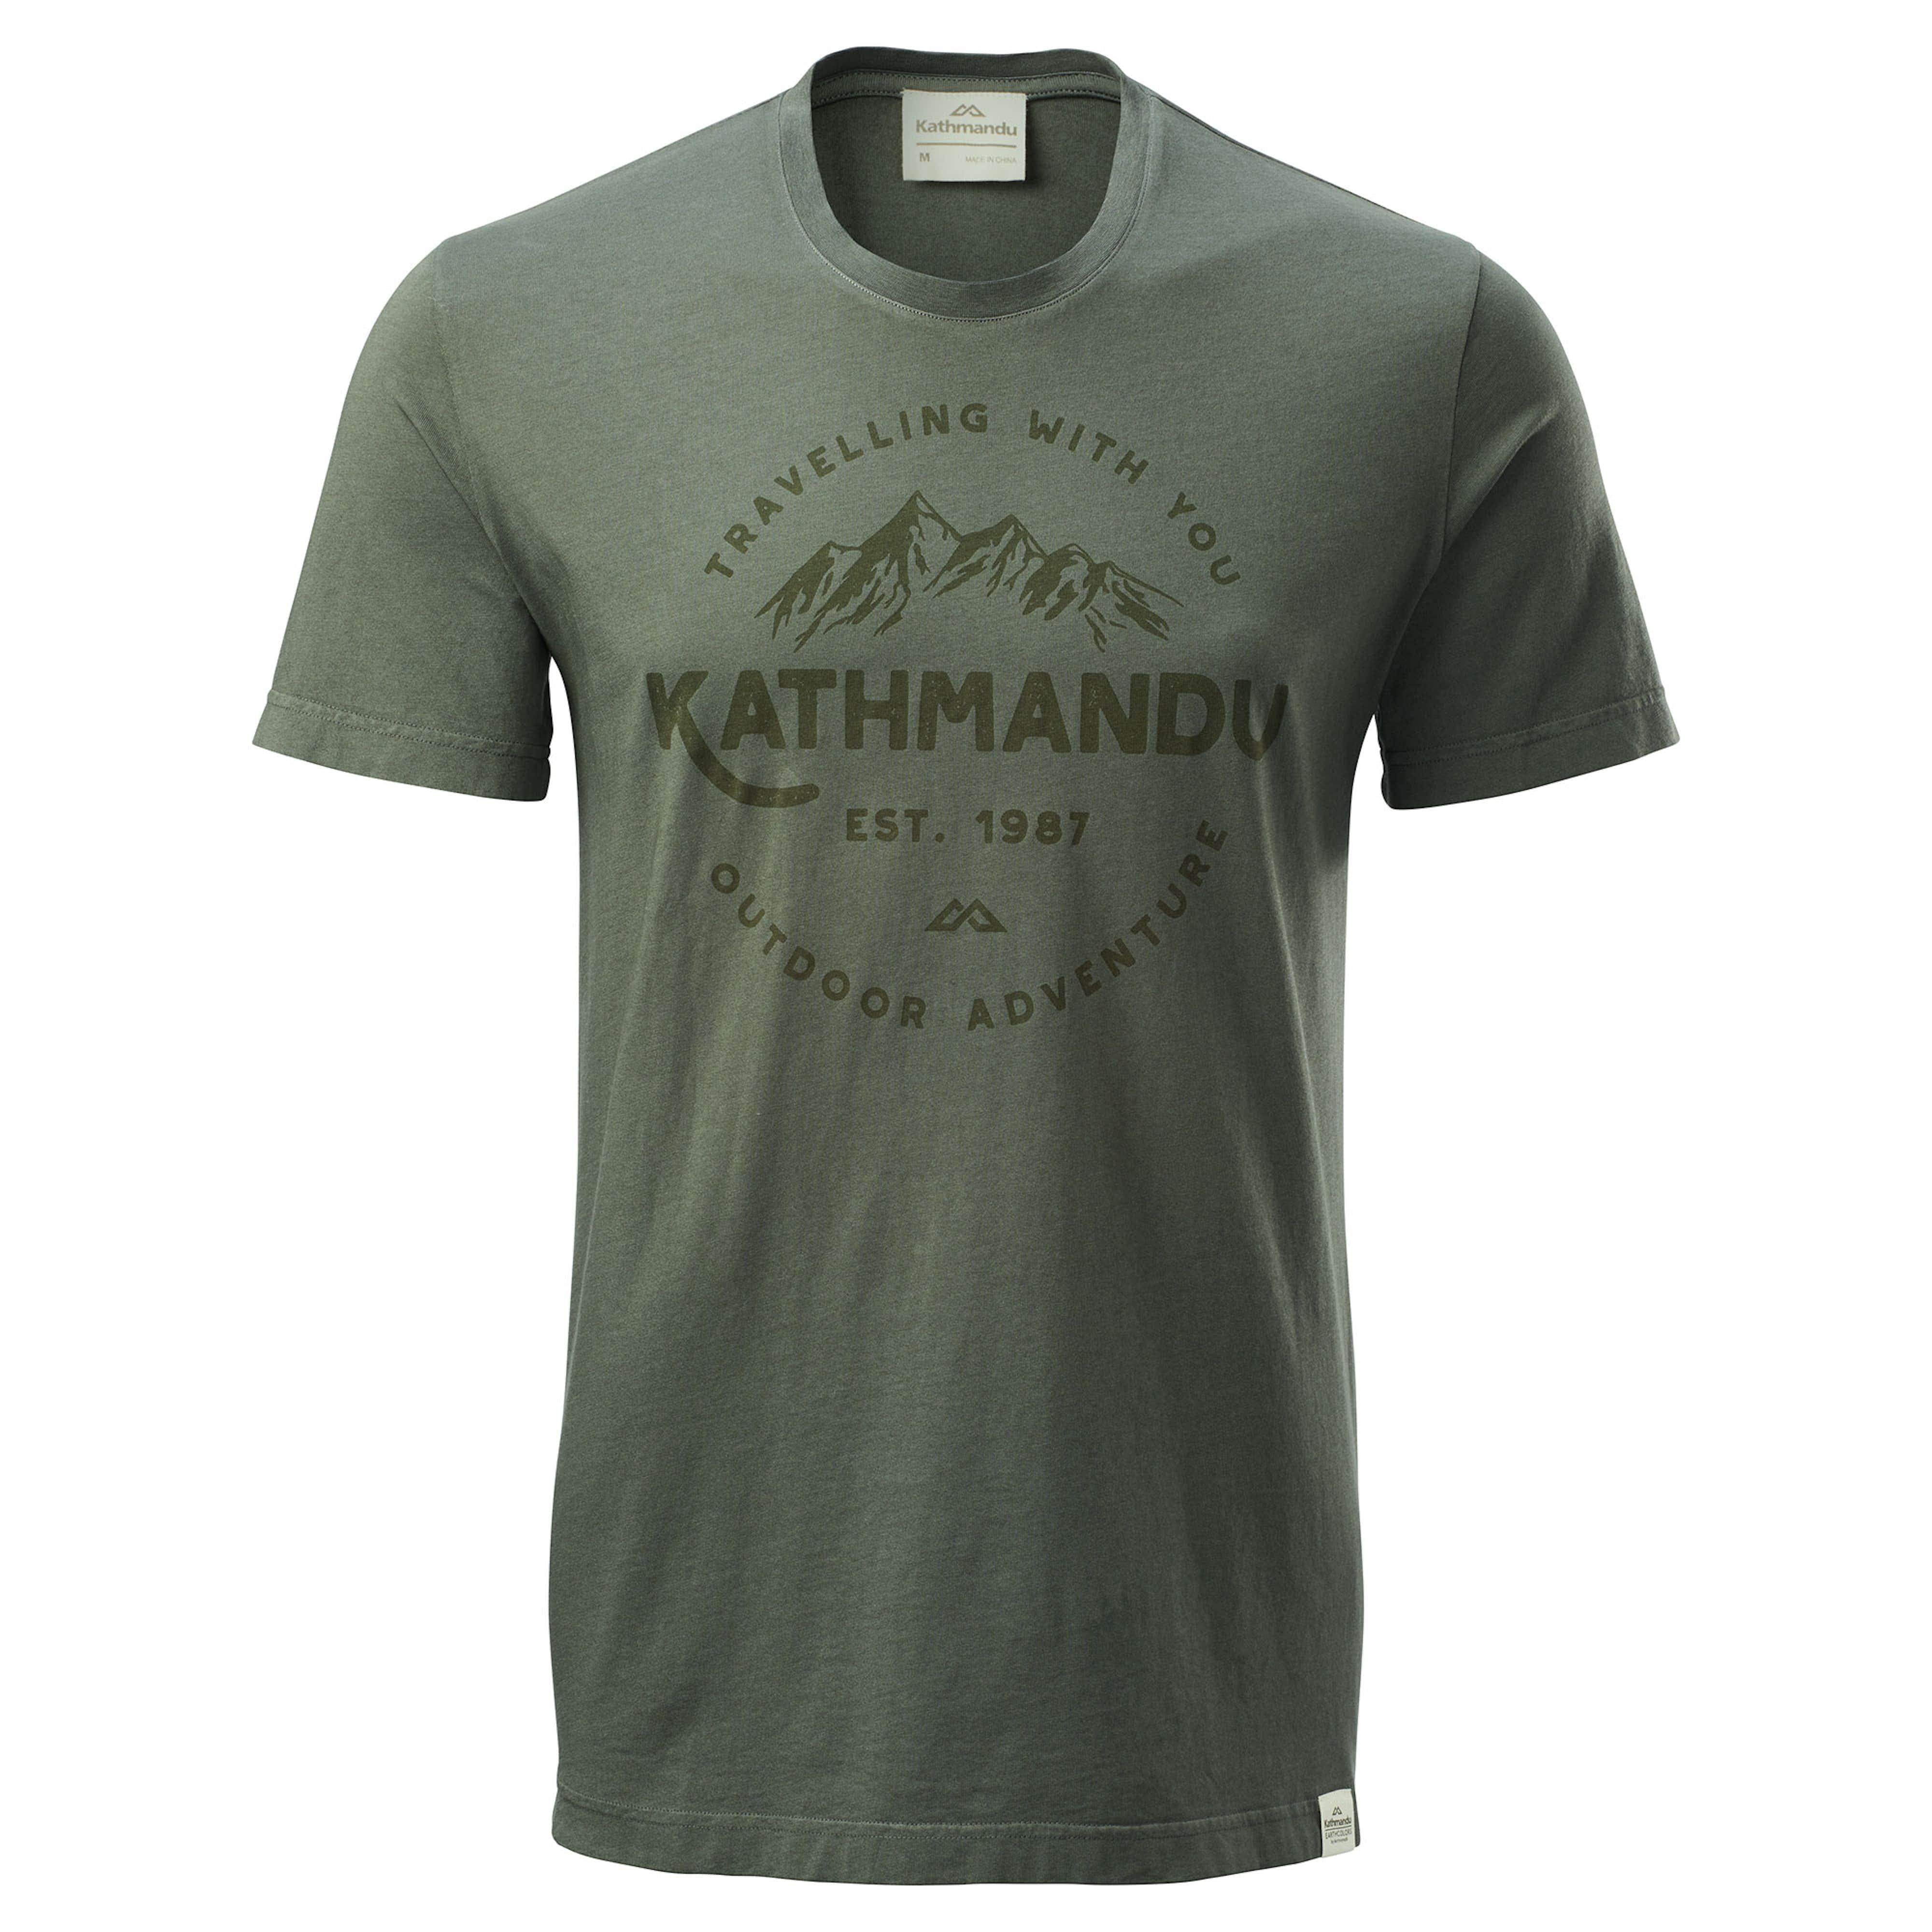 9b8738683454 Men's Shirts & T-Shirts Sale Online   Tops for Men   Kathmandu AU